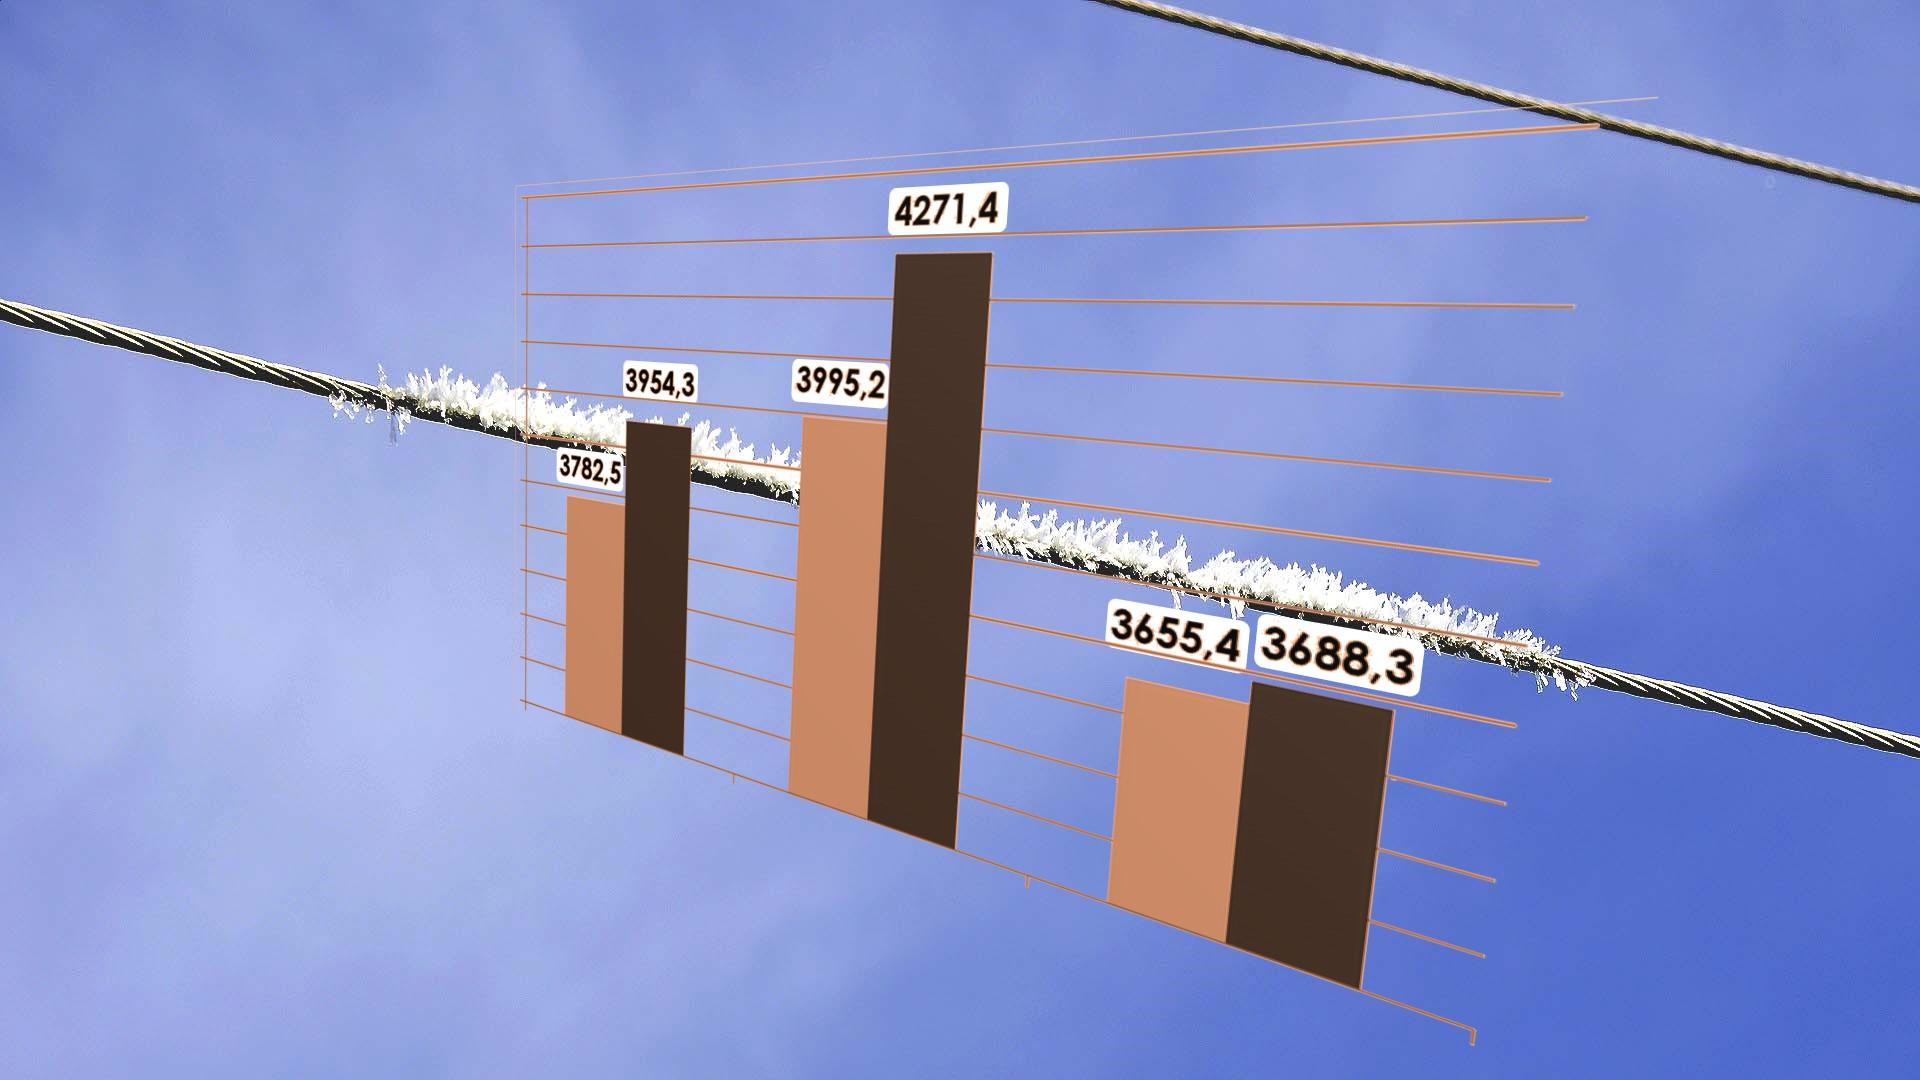 MAVIR record power consumption in Hungary